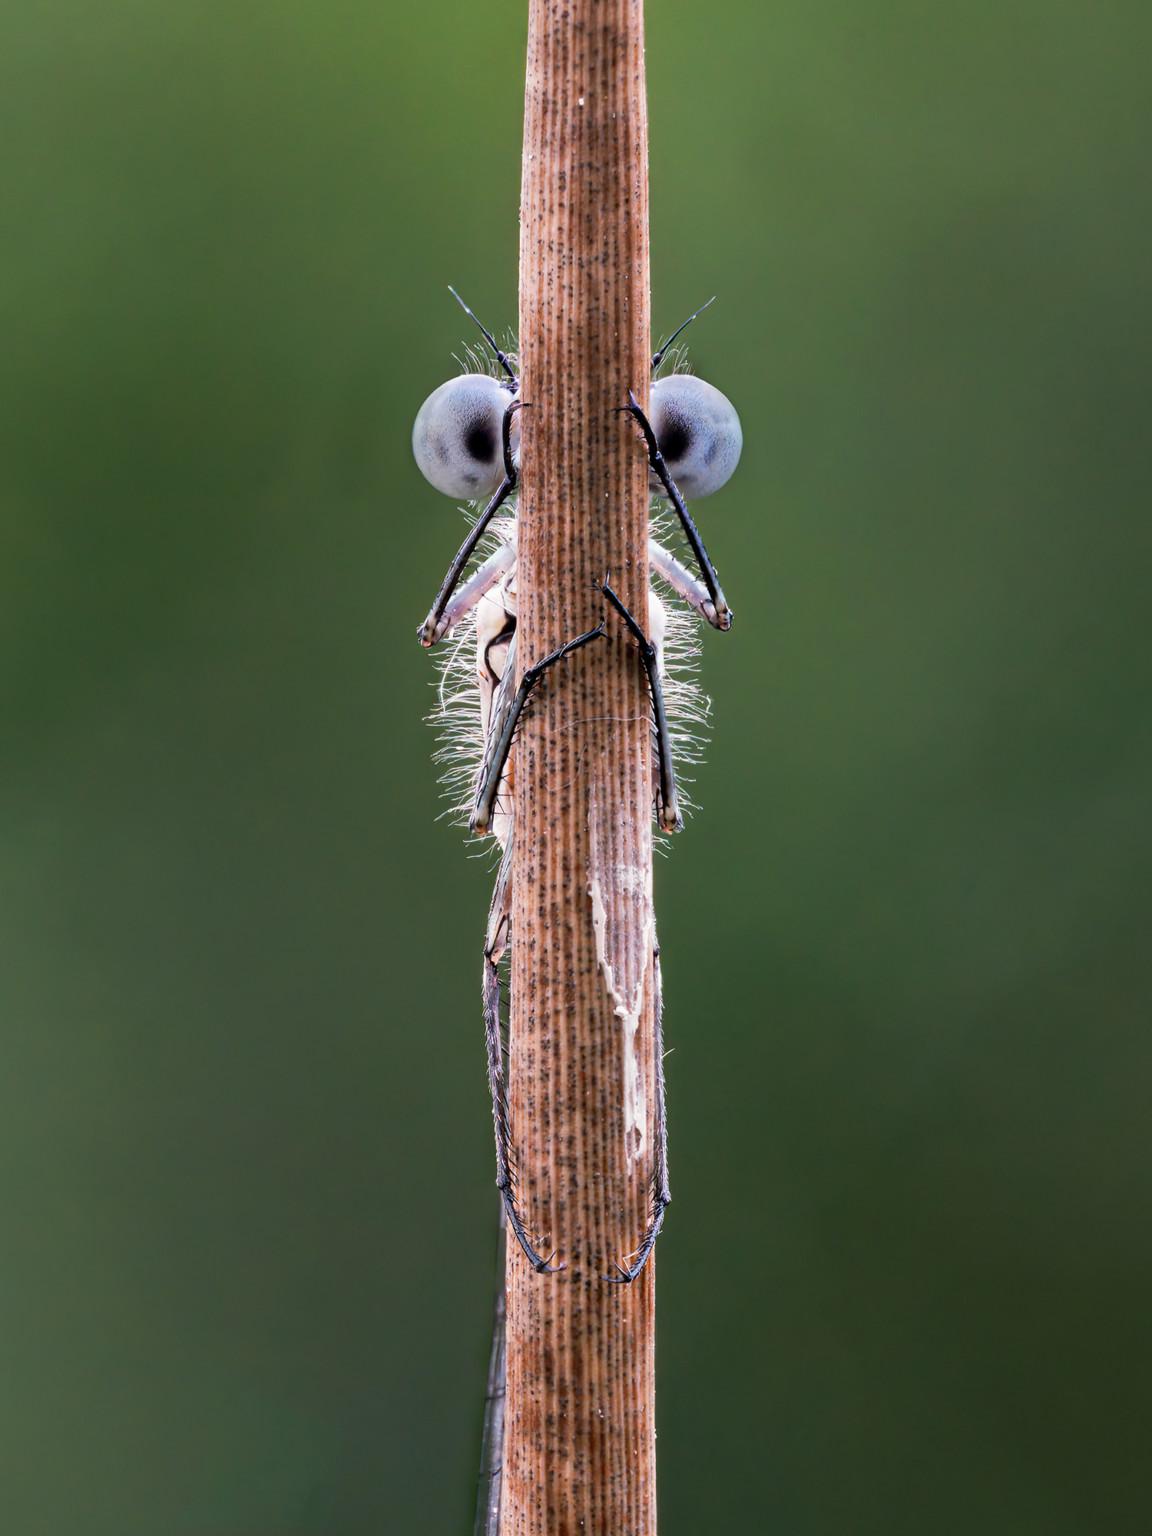 «Прятки». Фотограф Tim Hearn